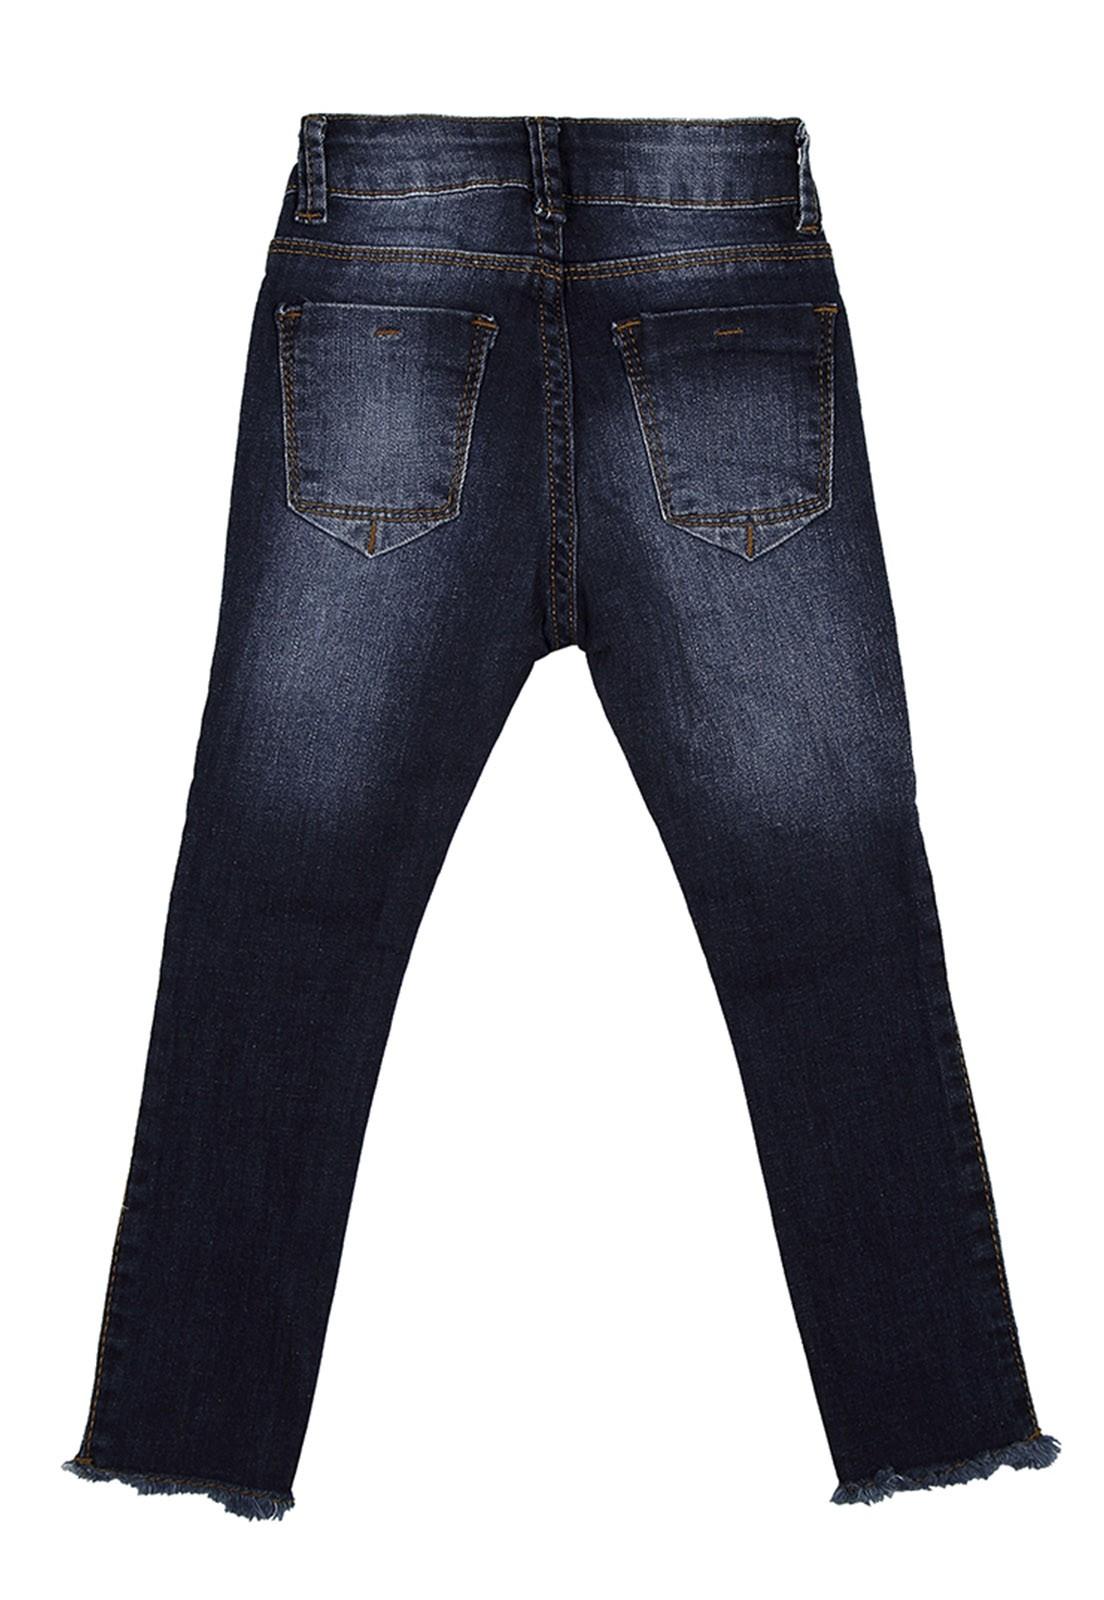 Calça Feminina Crawling Jeans